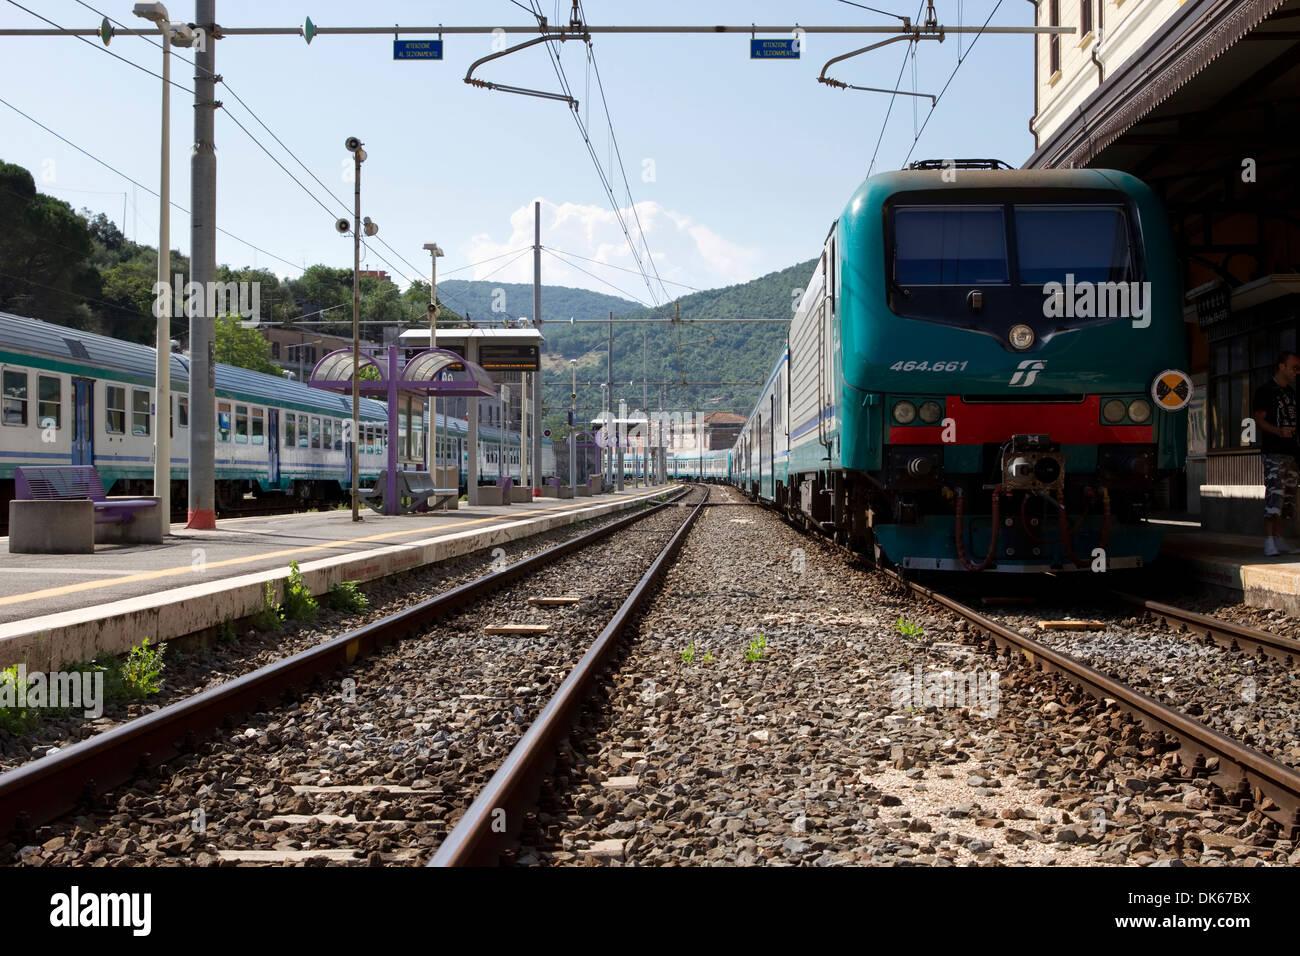 Zug in der Plattform im Tivoli Bahnhof in Lazio, Italien. Stockbild